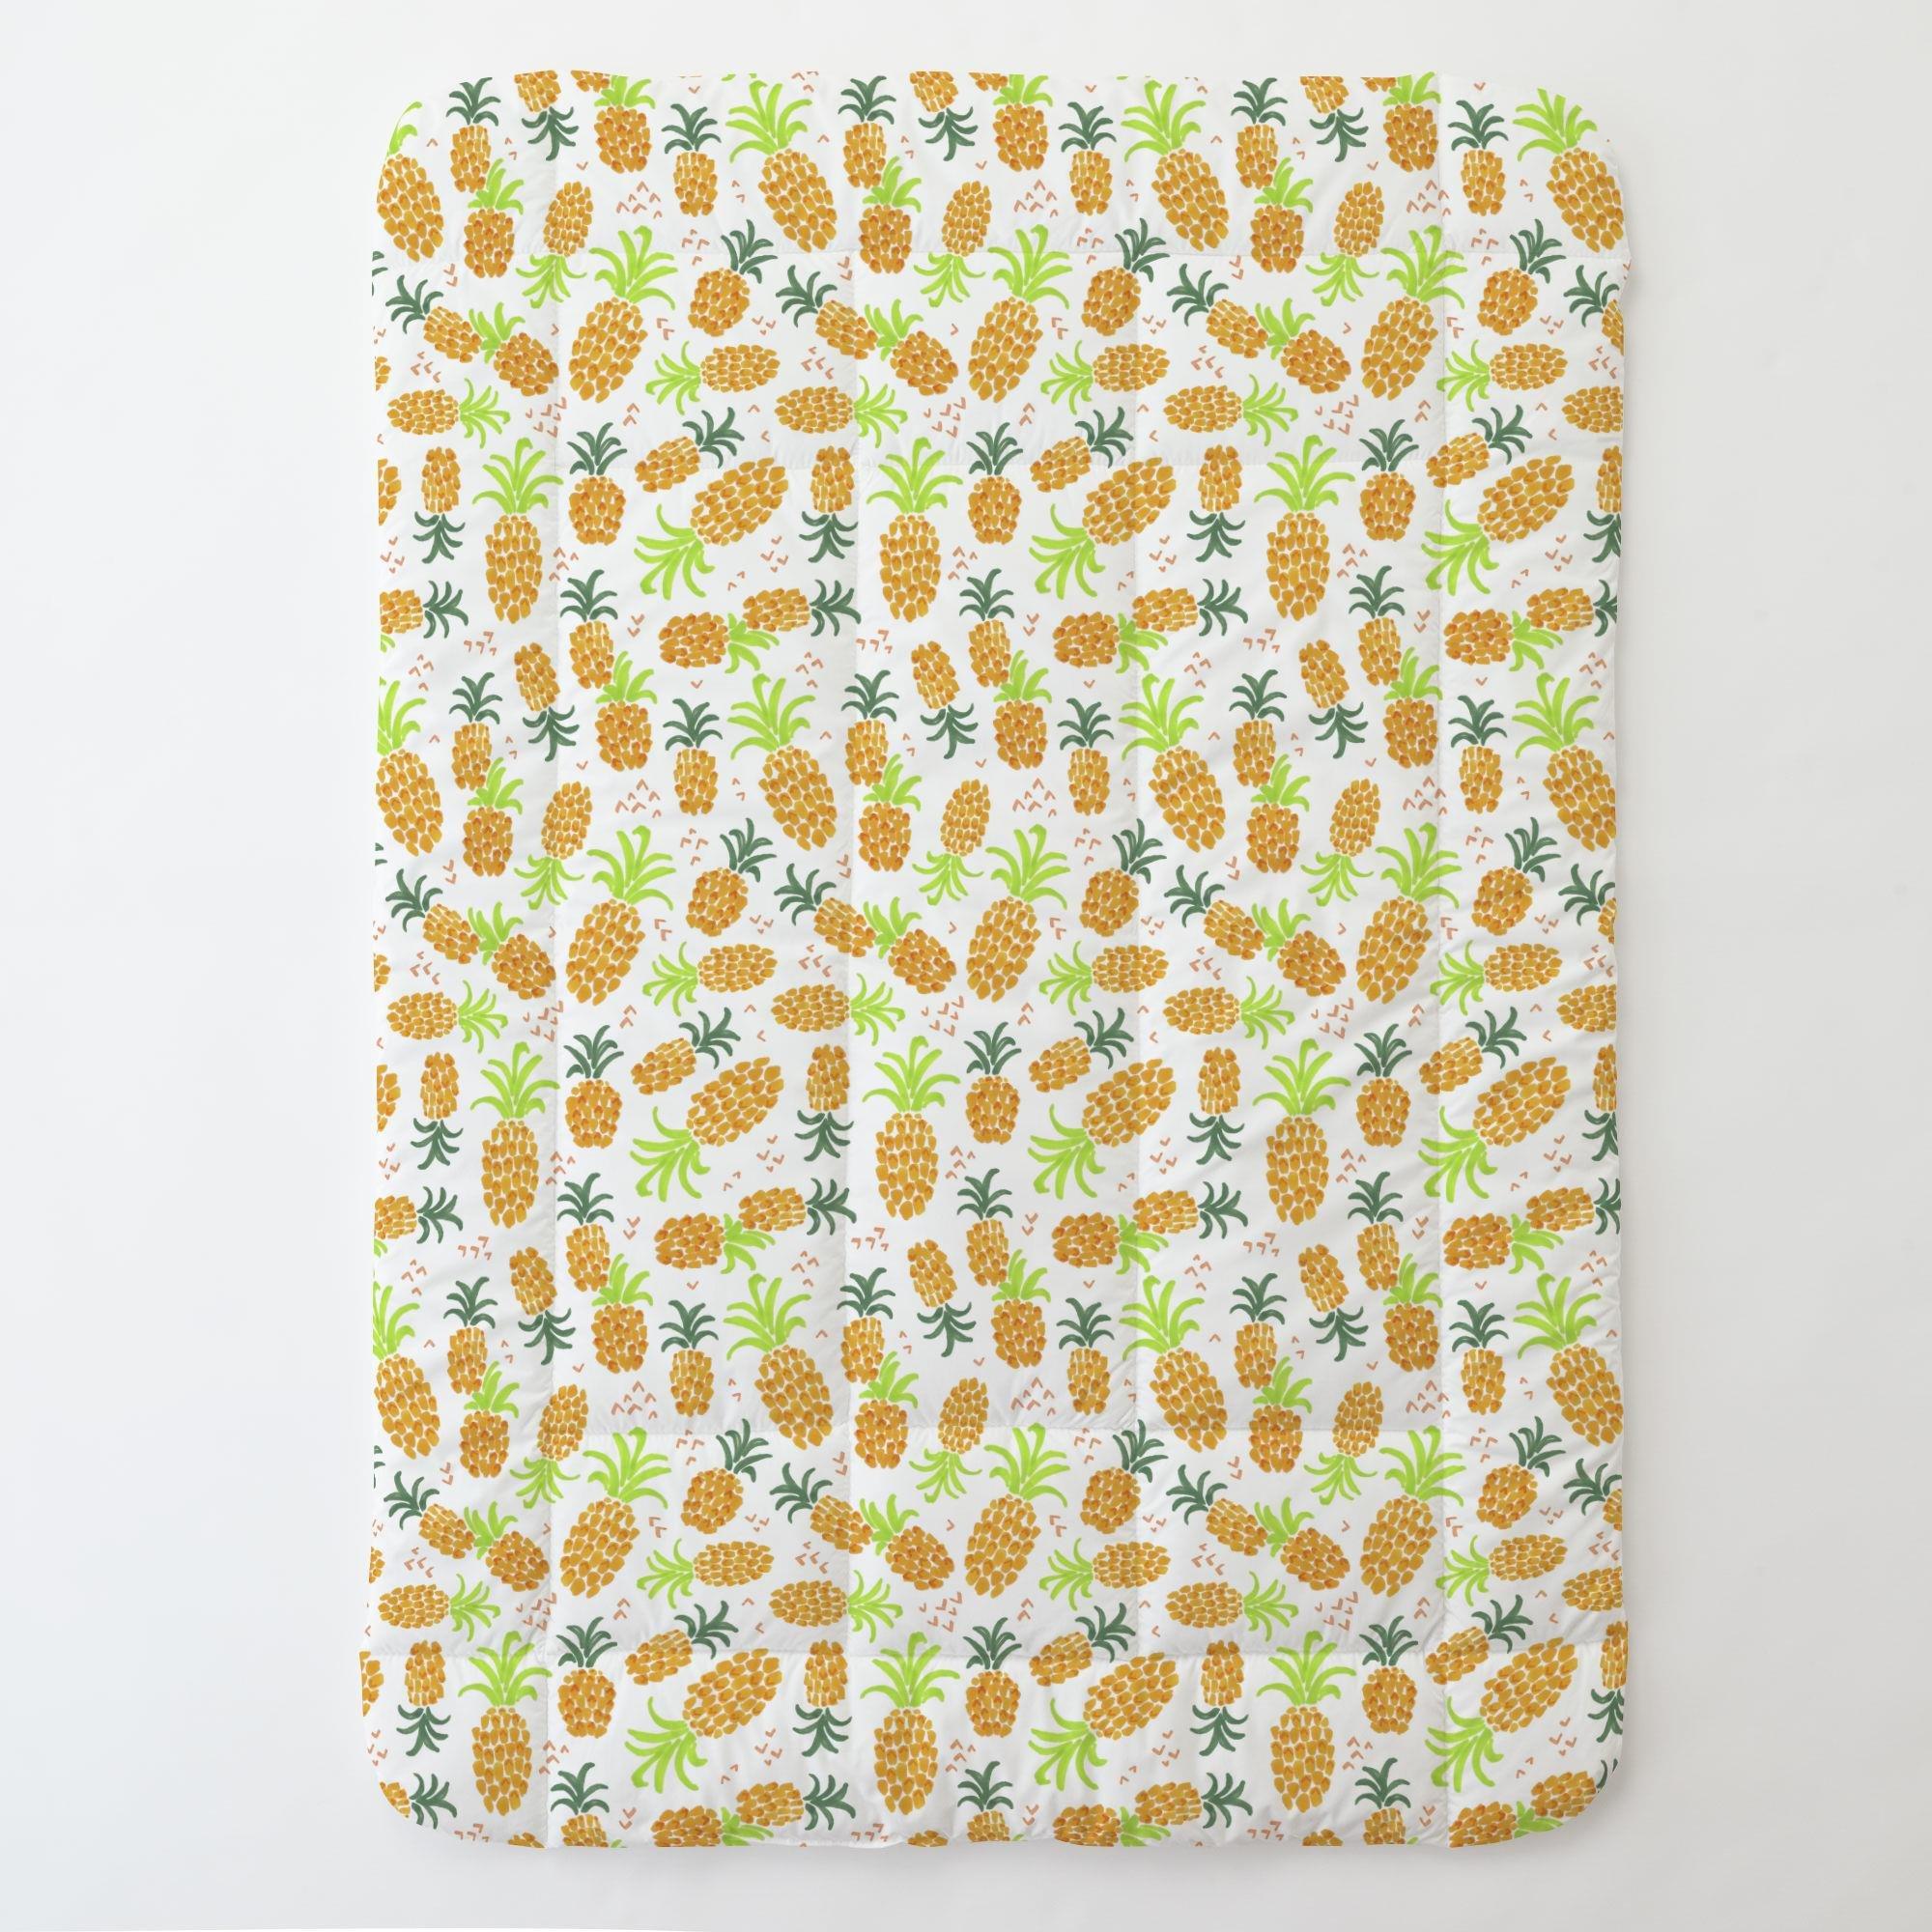 Carousel Designs Golden Pineapples Toddler Bed Comforter